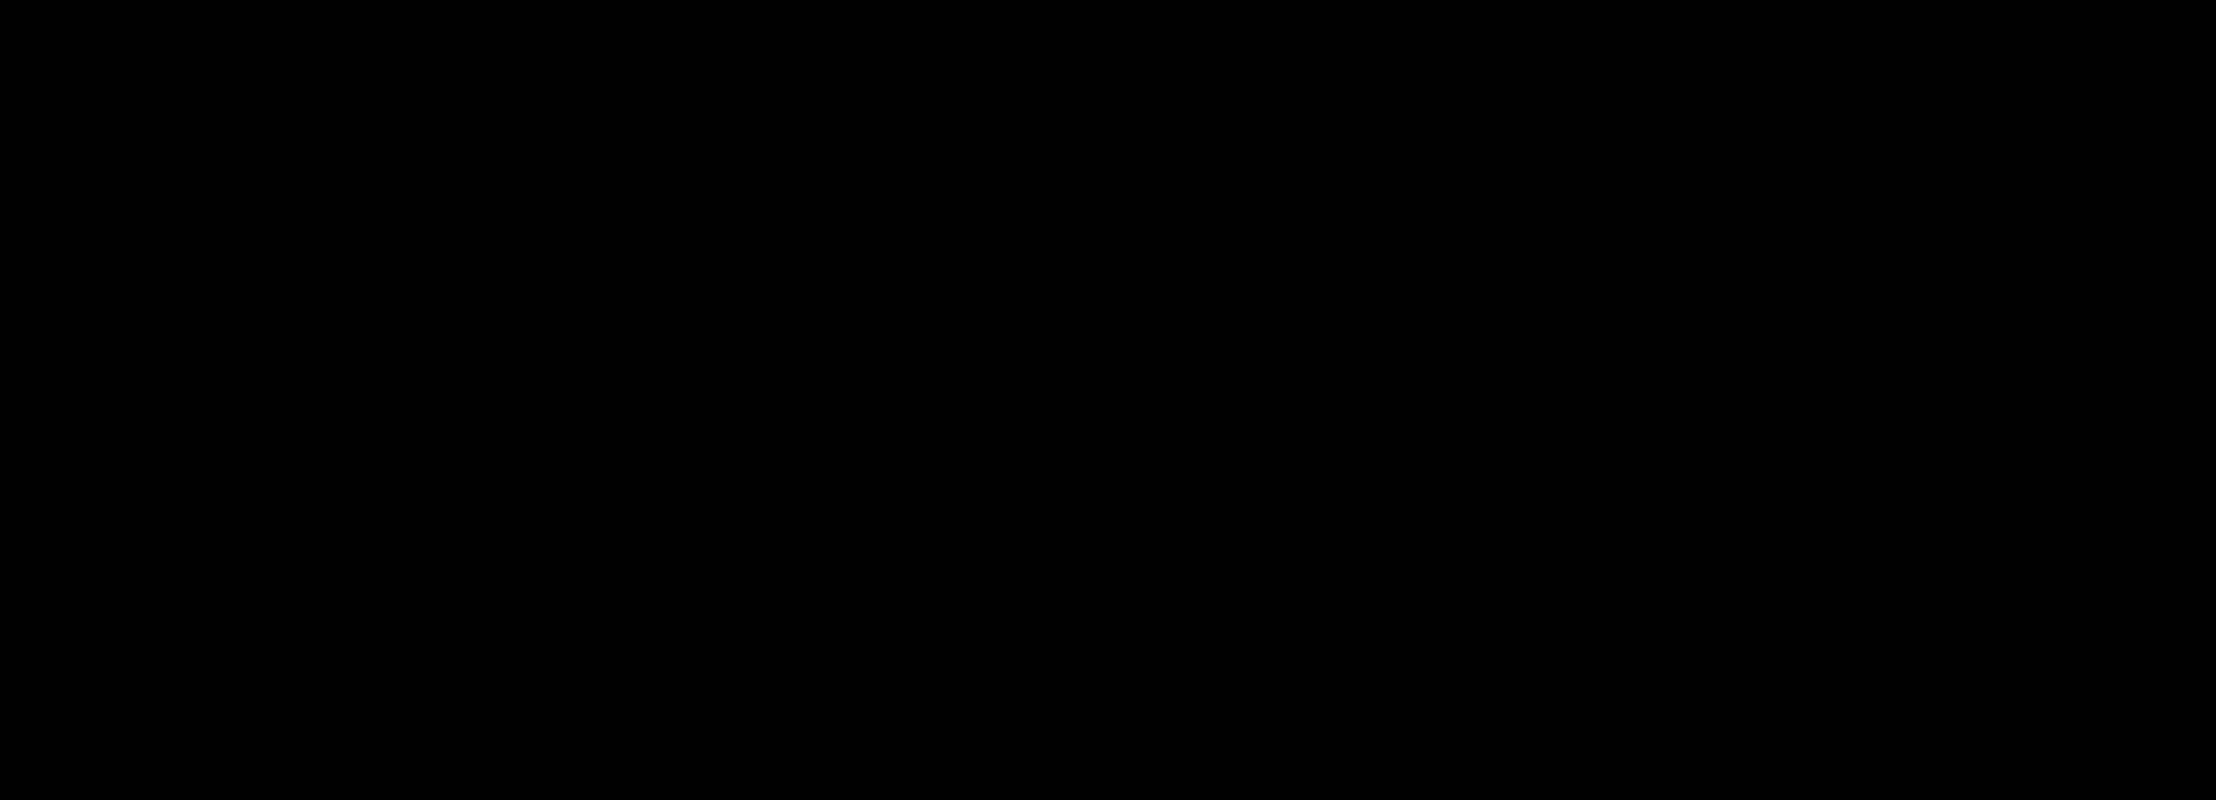 logo_dr+bronner.png